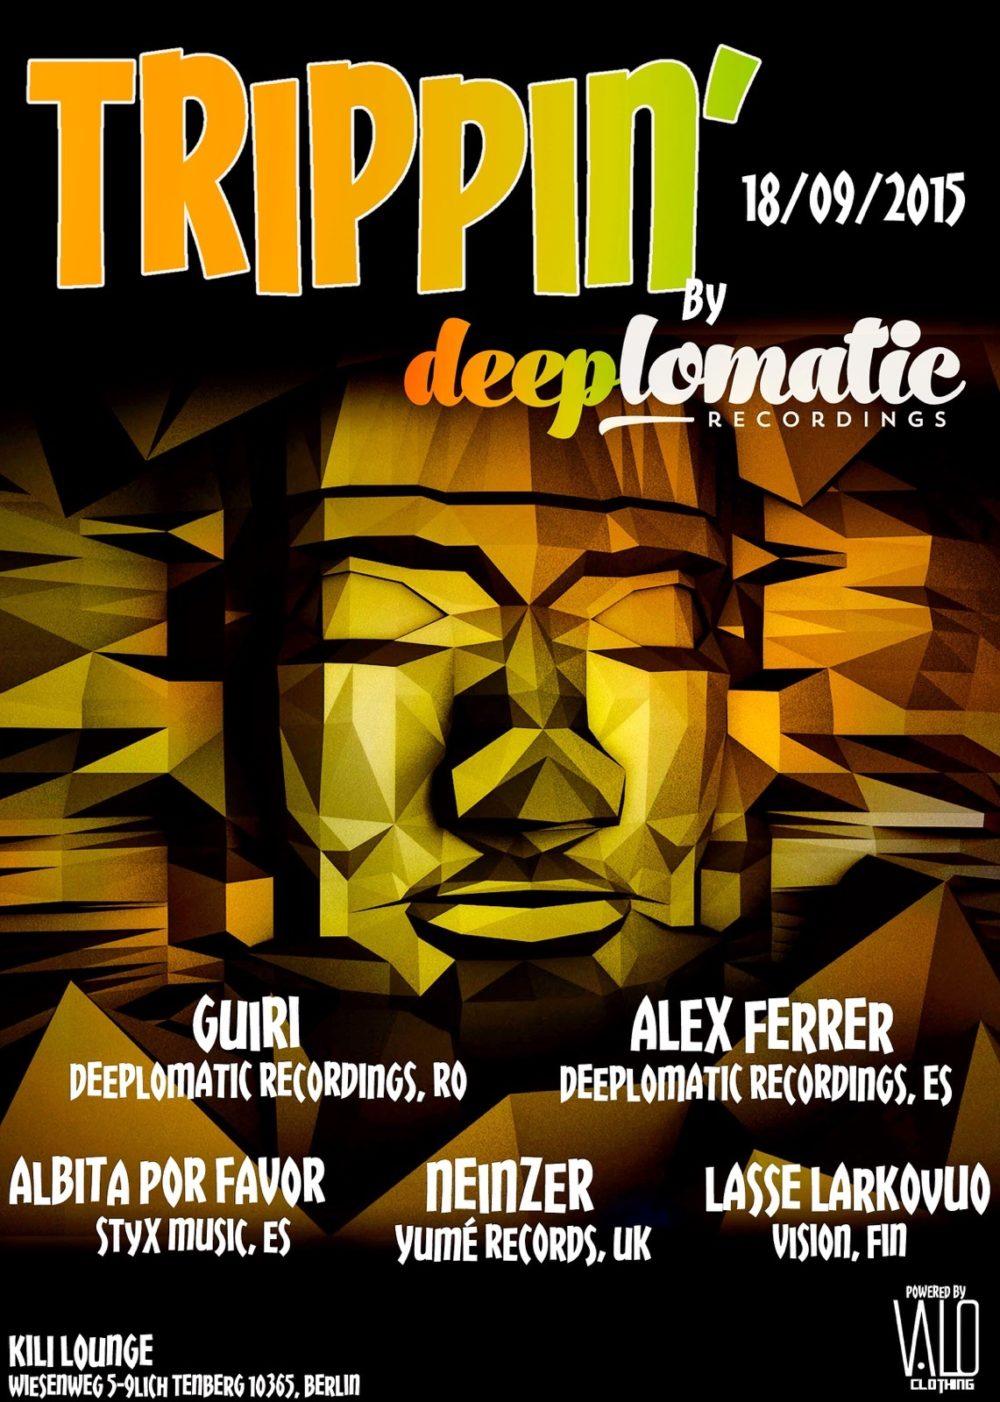 Trippin Deeplomatic @ Kili Lounge